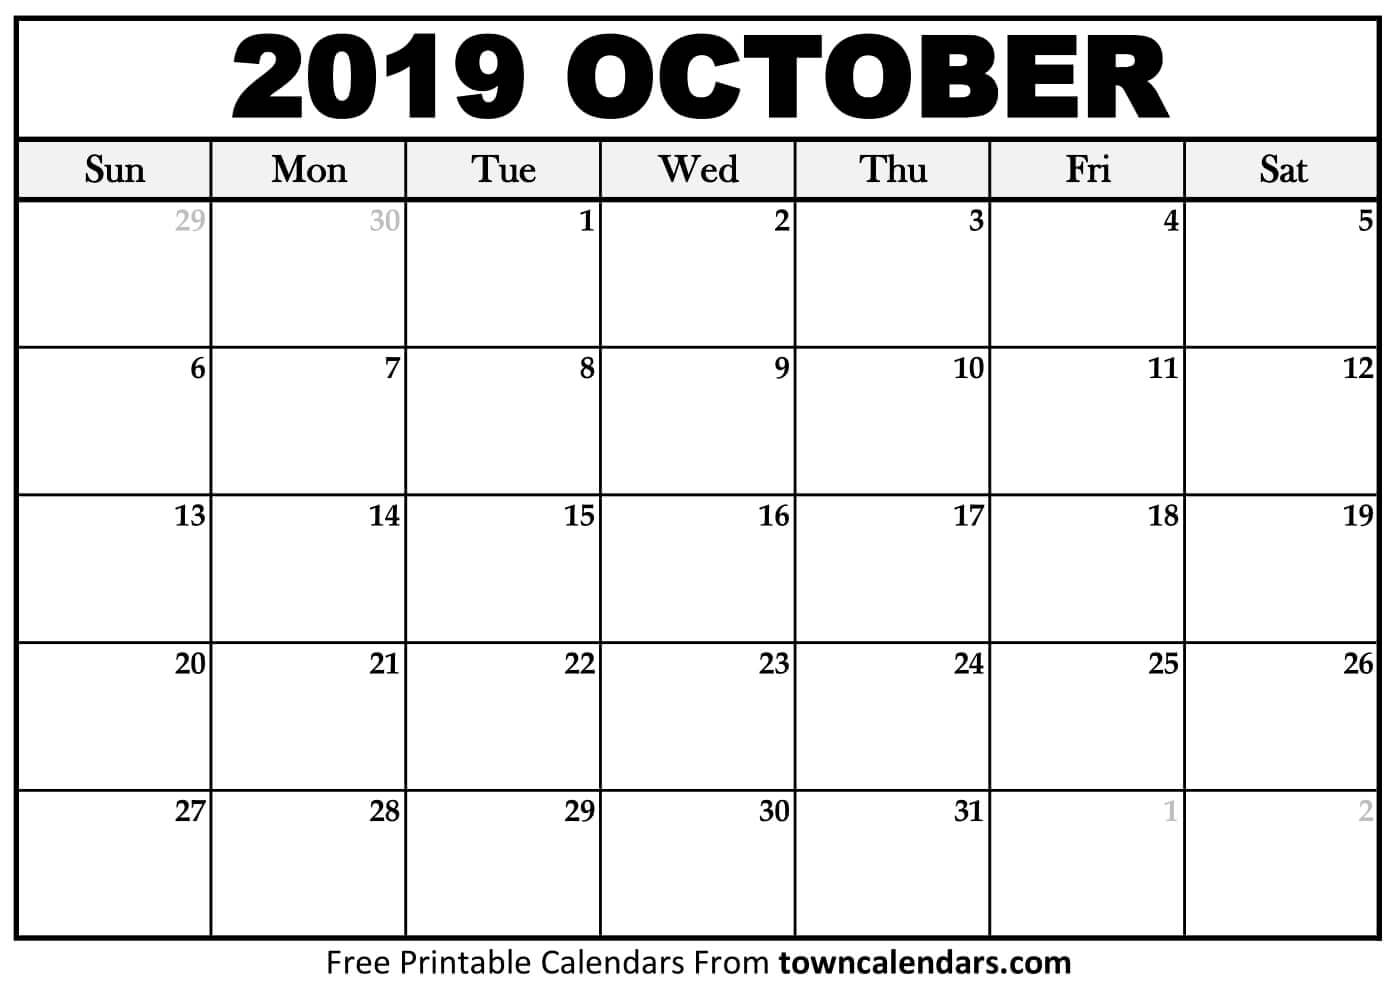 0Ctober 2019 Calendar | Printable Calendar Free